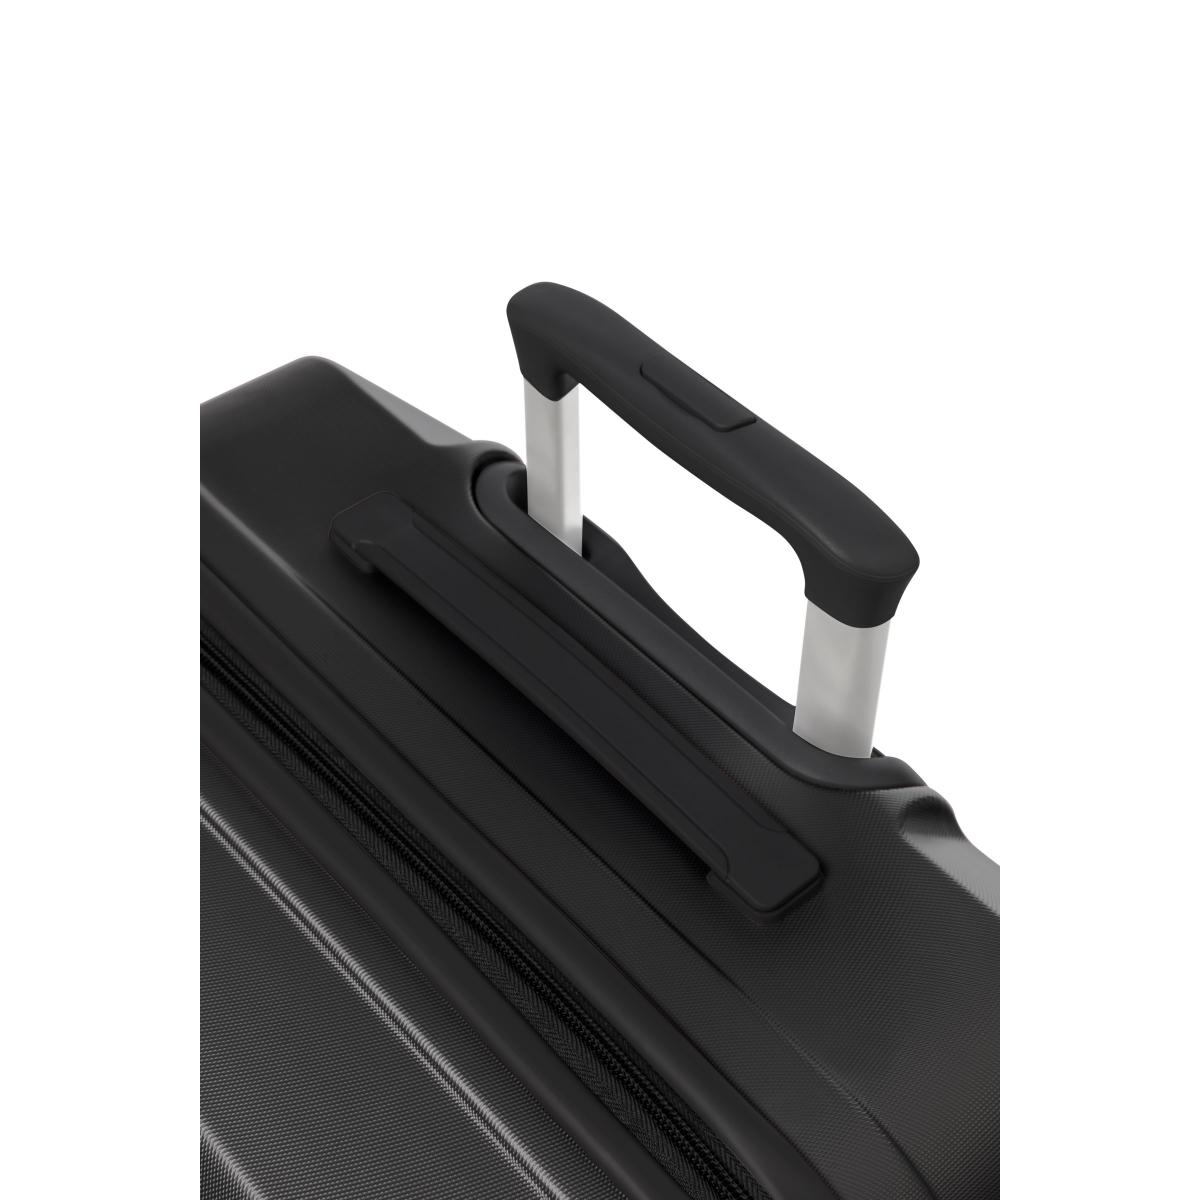 Gedox Abs Premium Tonaton 3'lü Valiz Seyahat Seti - Model:500.01 Siyah